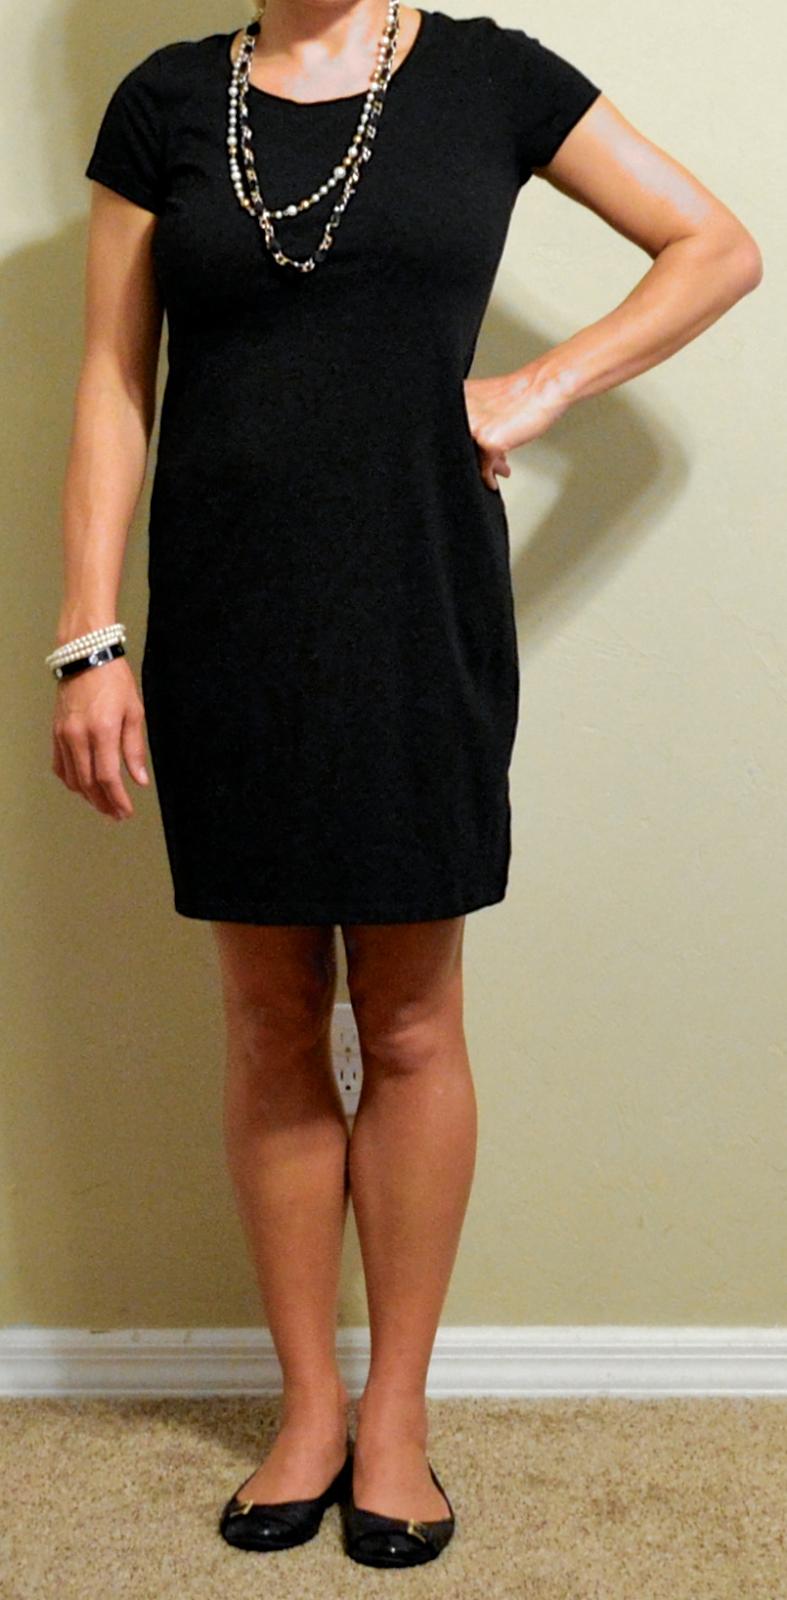 Outfit Posts Guest Post - V Black T-shirt Dress Black Buckle Flats